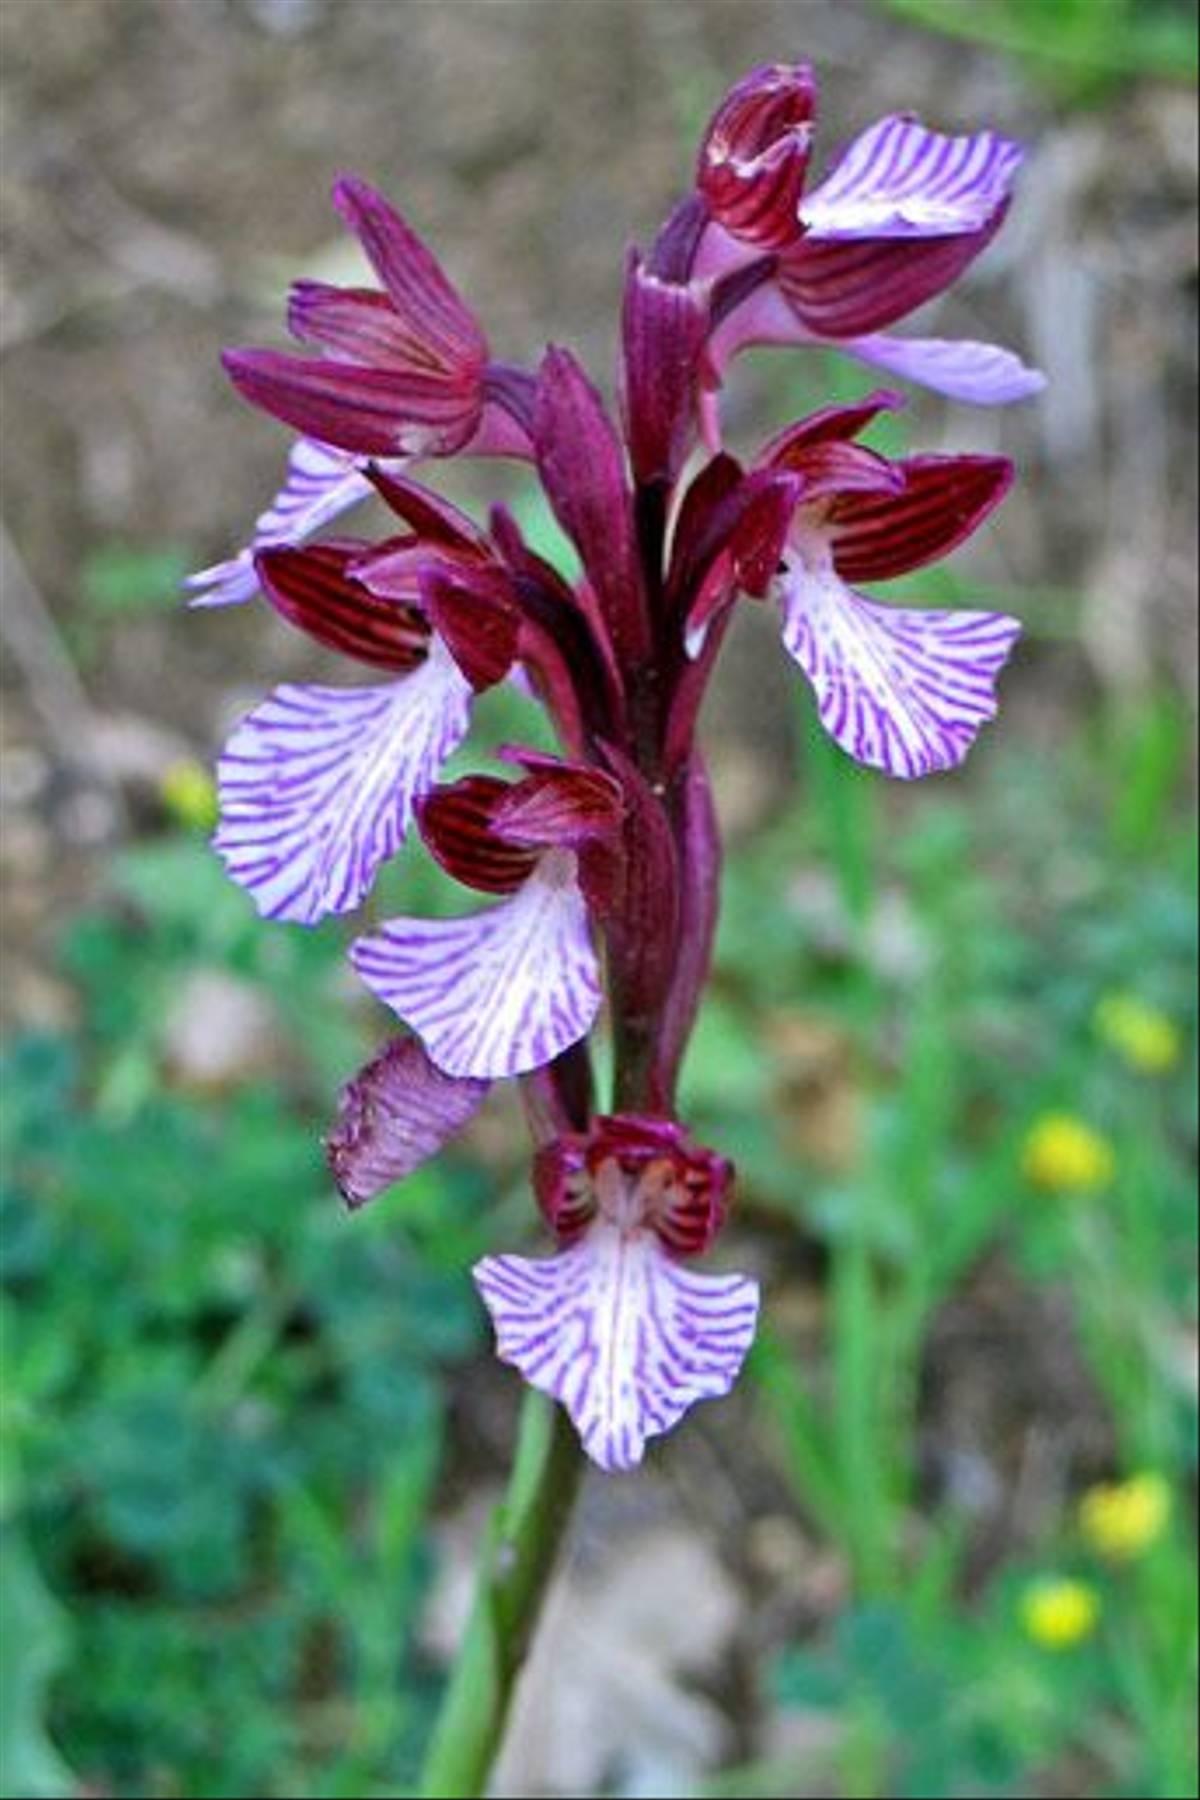 Pink Butterfly Orchid, Orchis papilonacea (Paul Harmes)